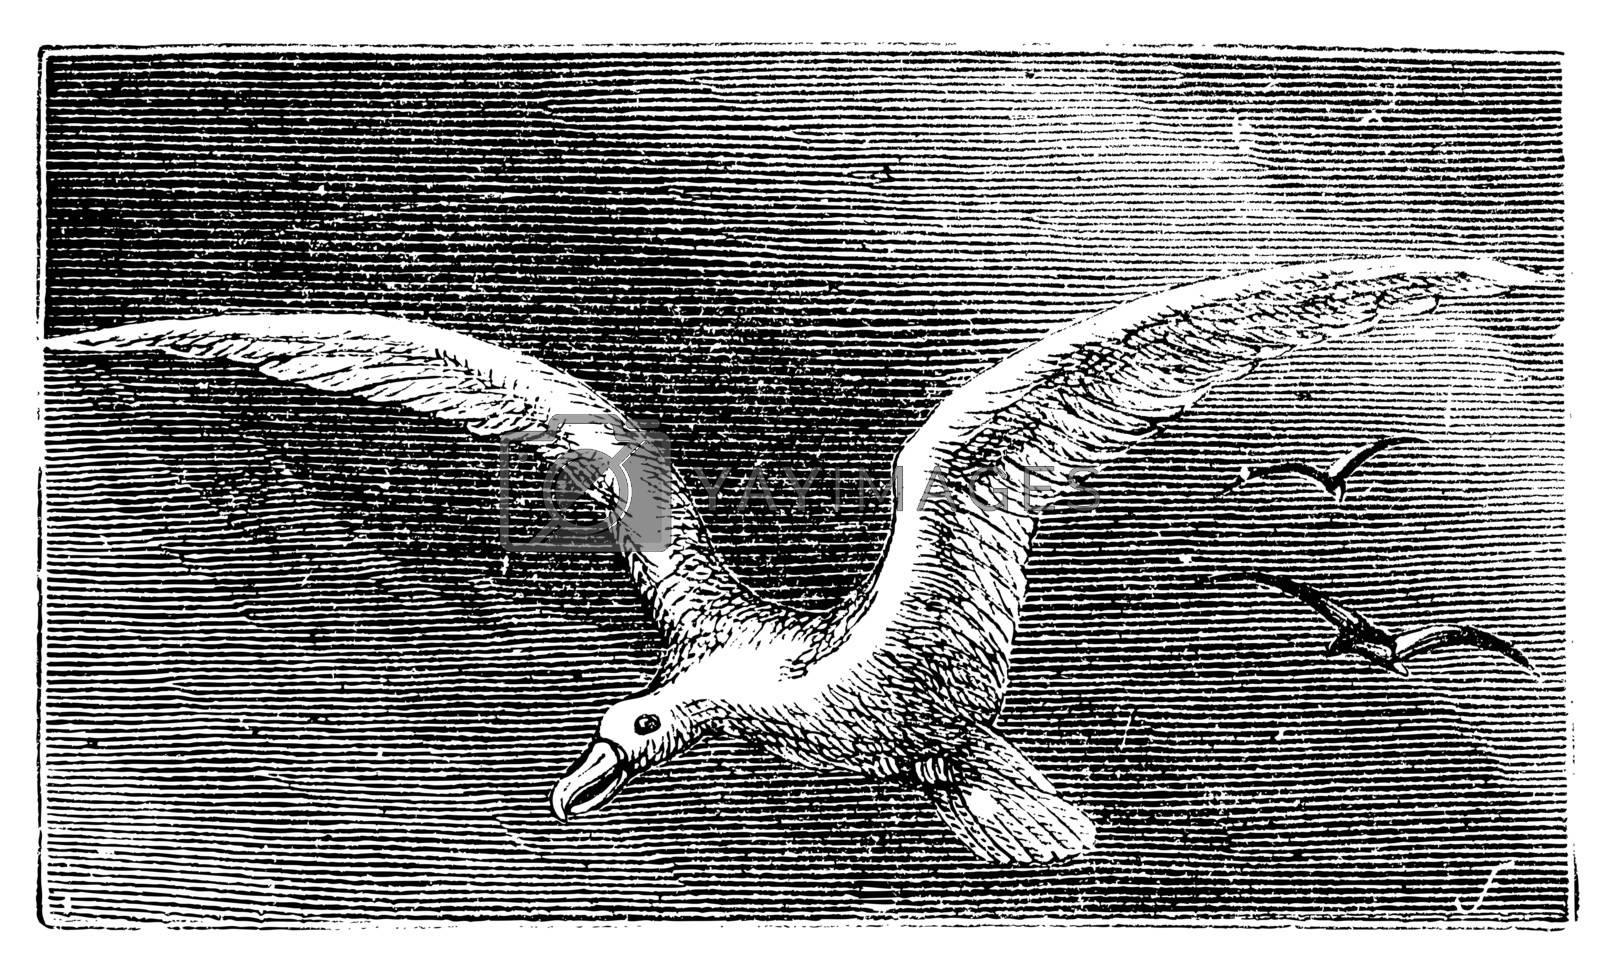 Wandering albastross, Snowy albatross, white-winged albatross or diomedea exulans engraving. Old vintage illustration of flying wandering albastross.